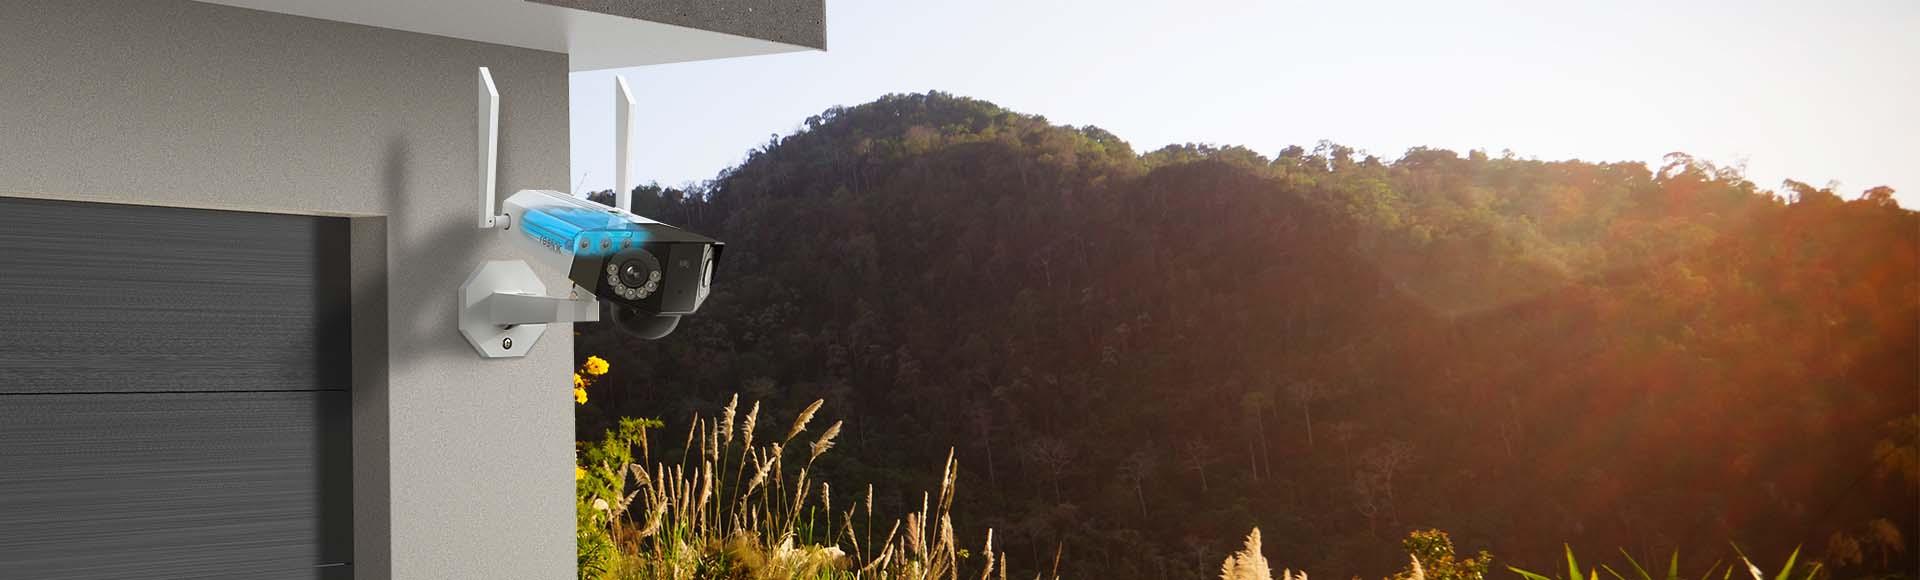 Battery/Solar Powered Eco-Friendly Security Camera